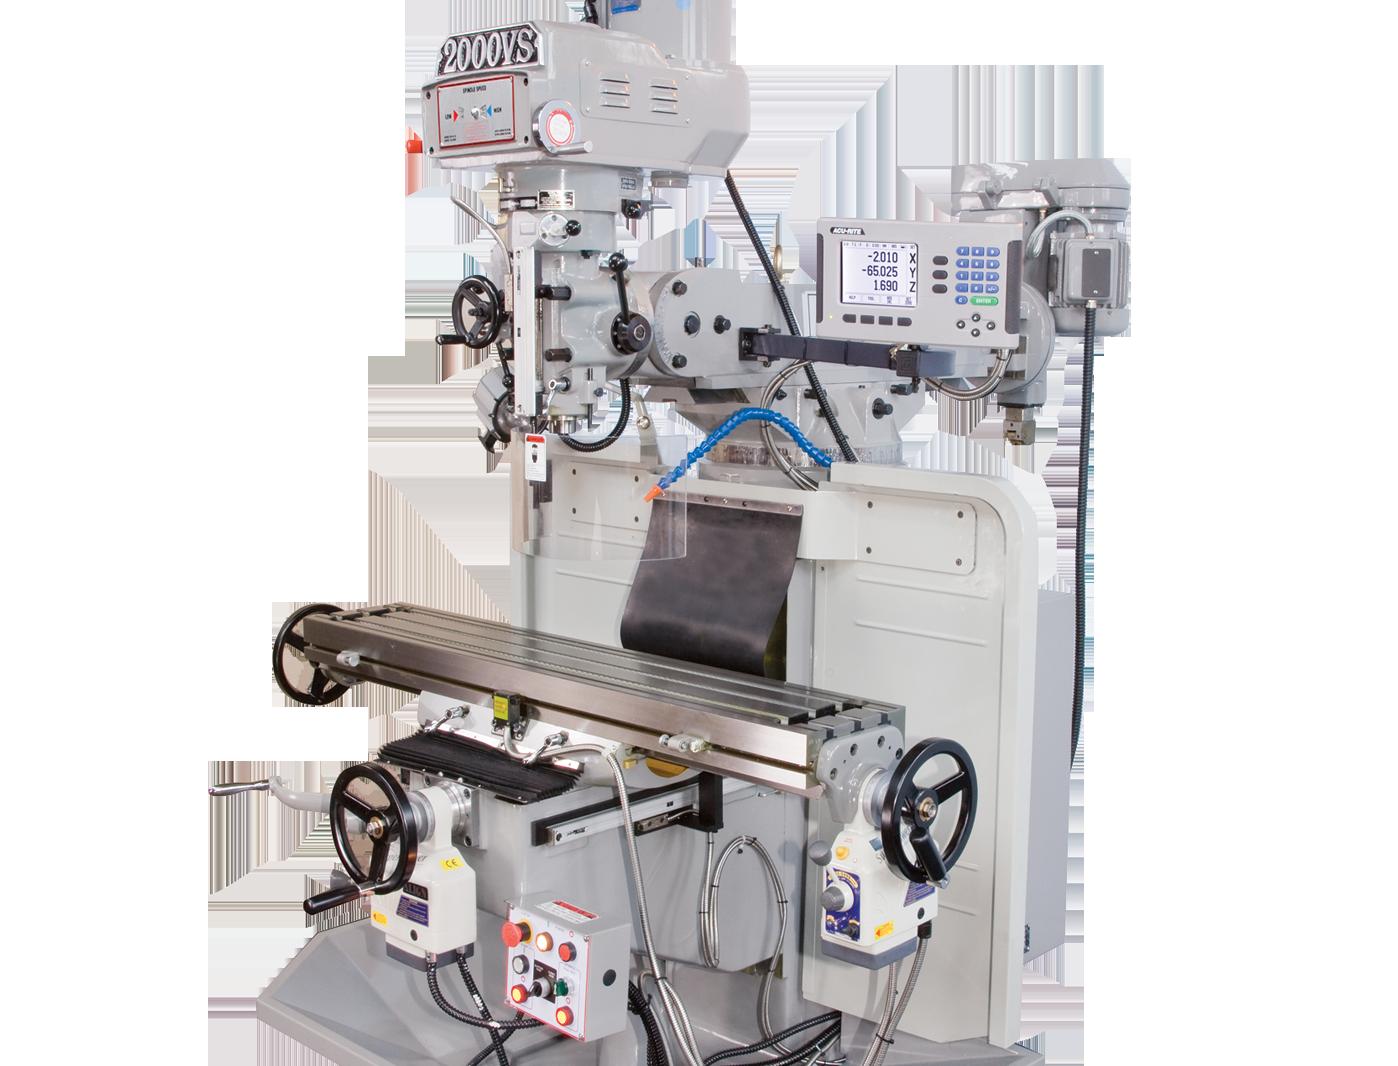 EUROPA Milltech 2000VS Turret Mills